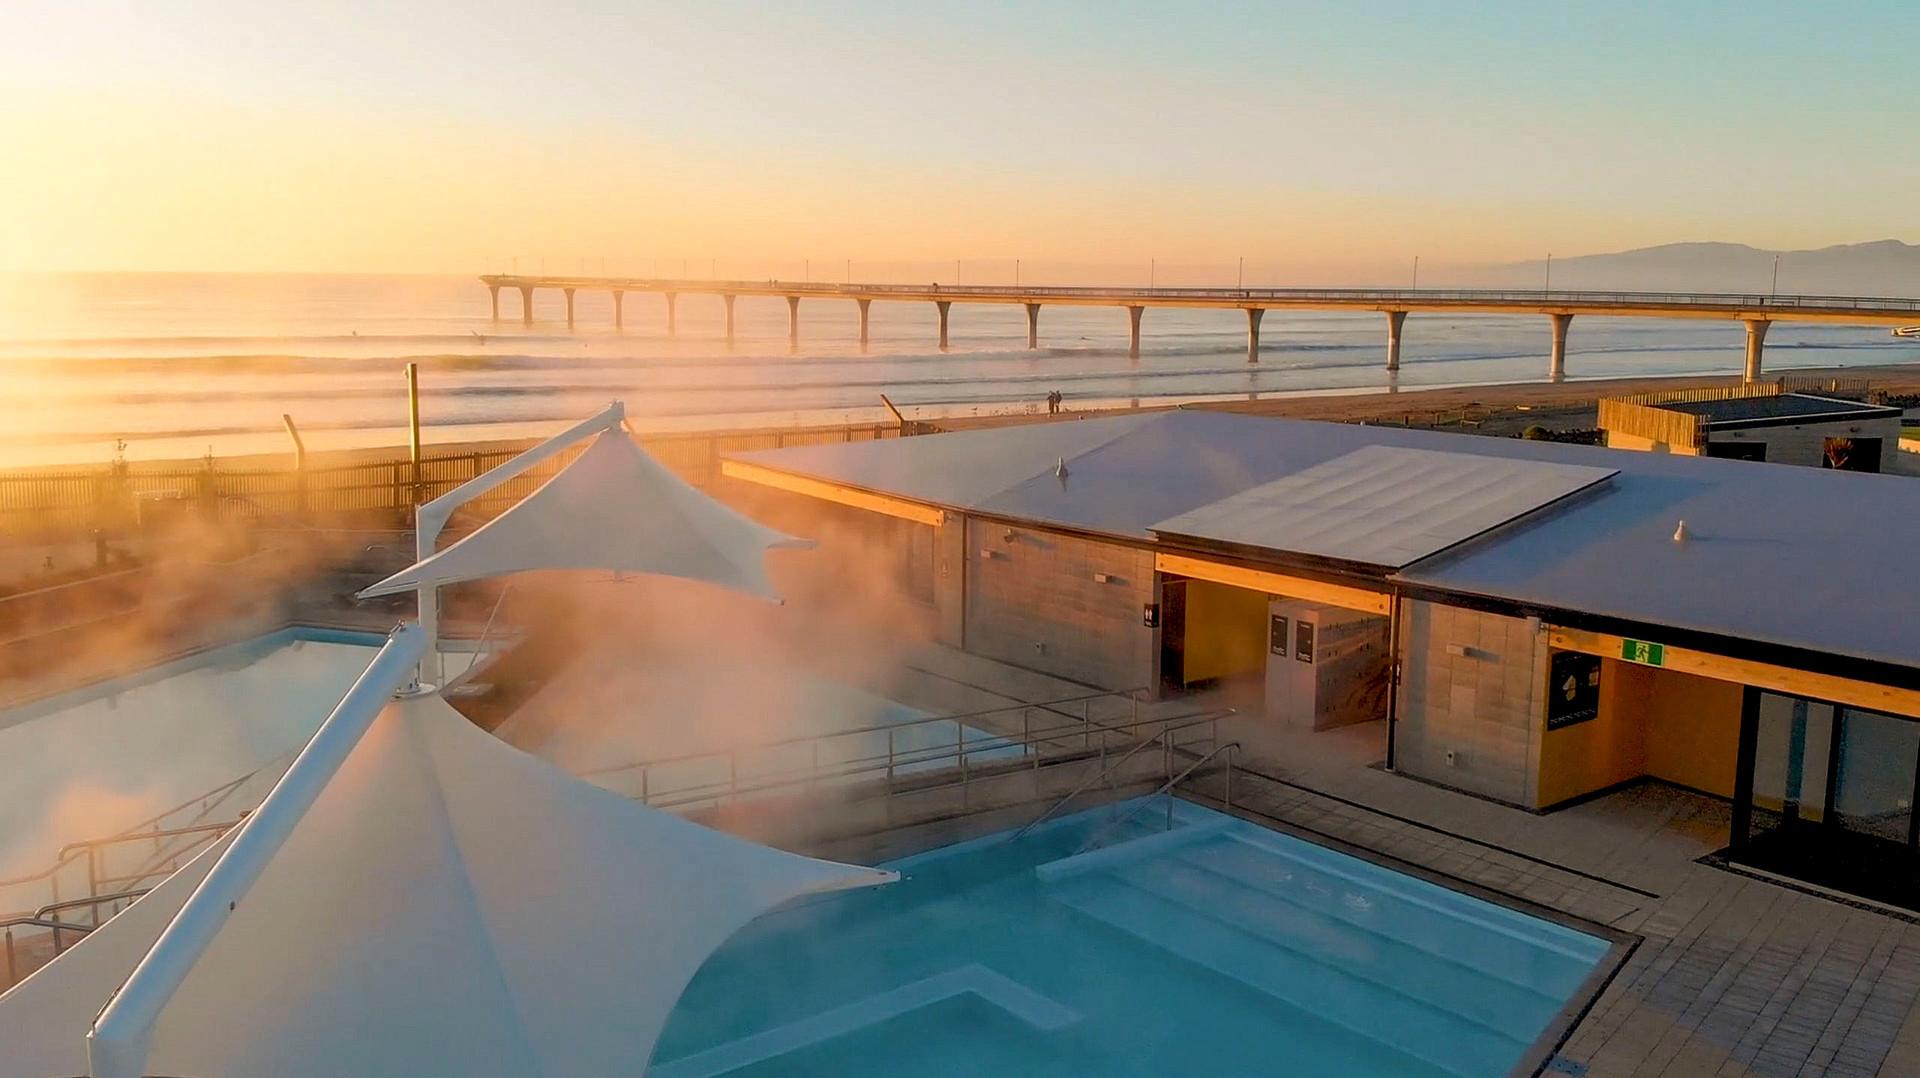 New-brighton-hot-pools-landscape-aerial